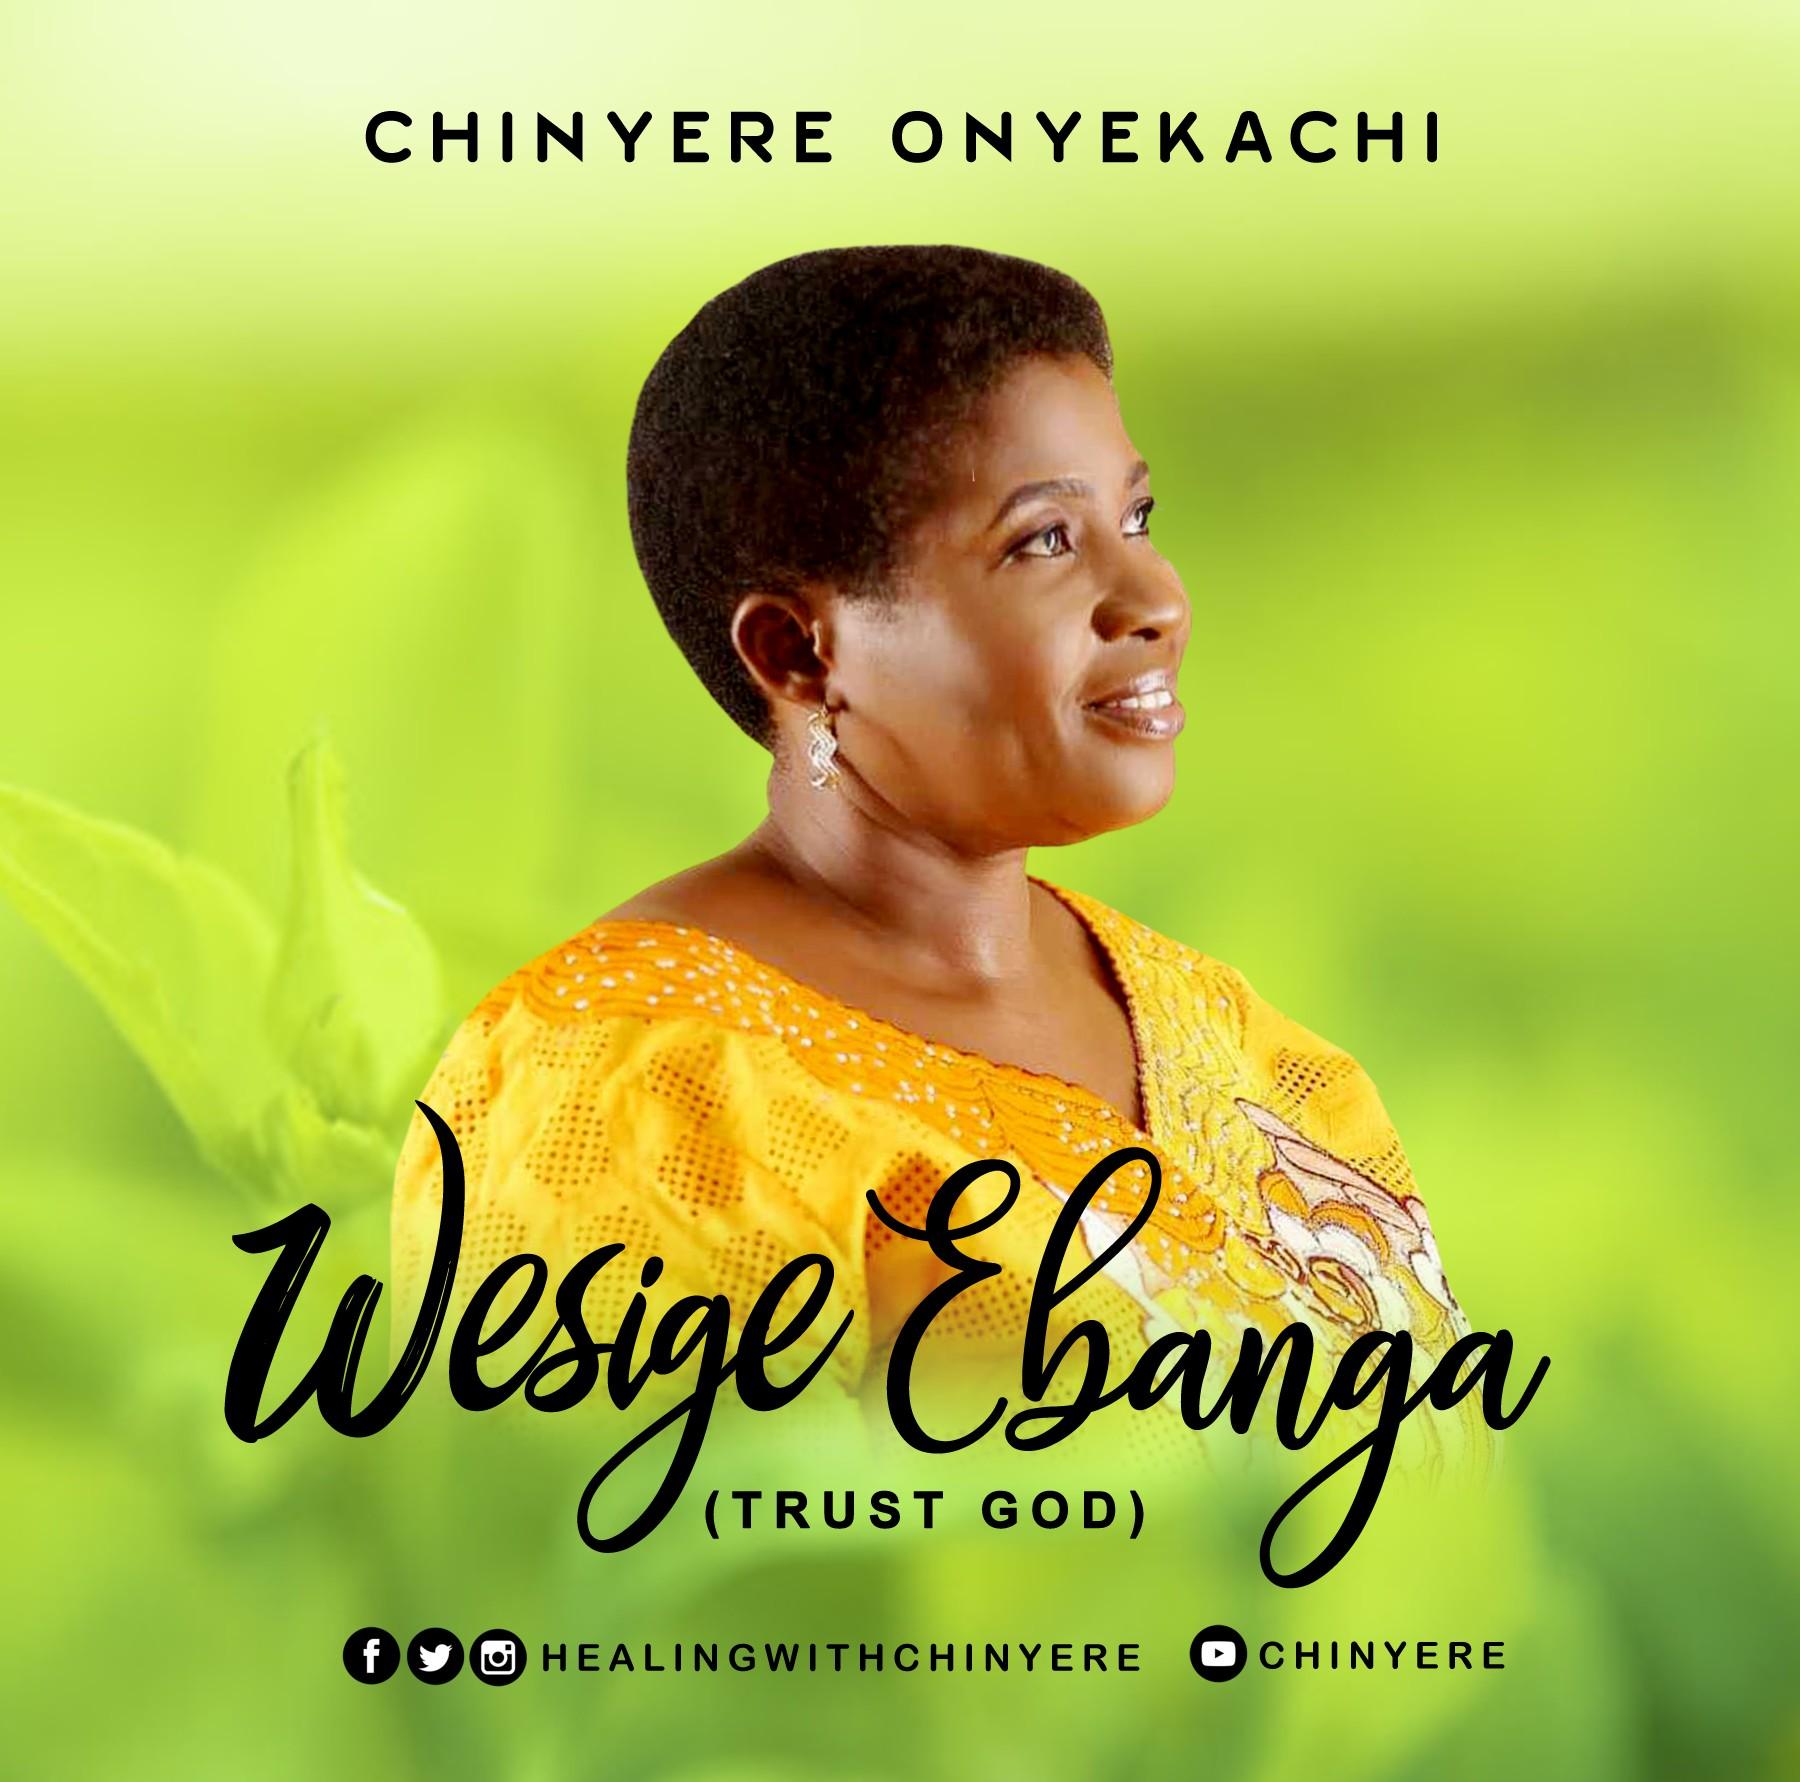 Chinyere Onyekachi Wesige Ebanga